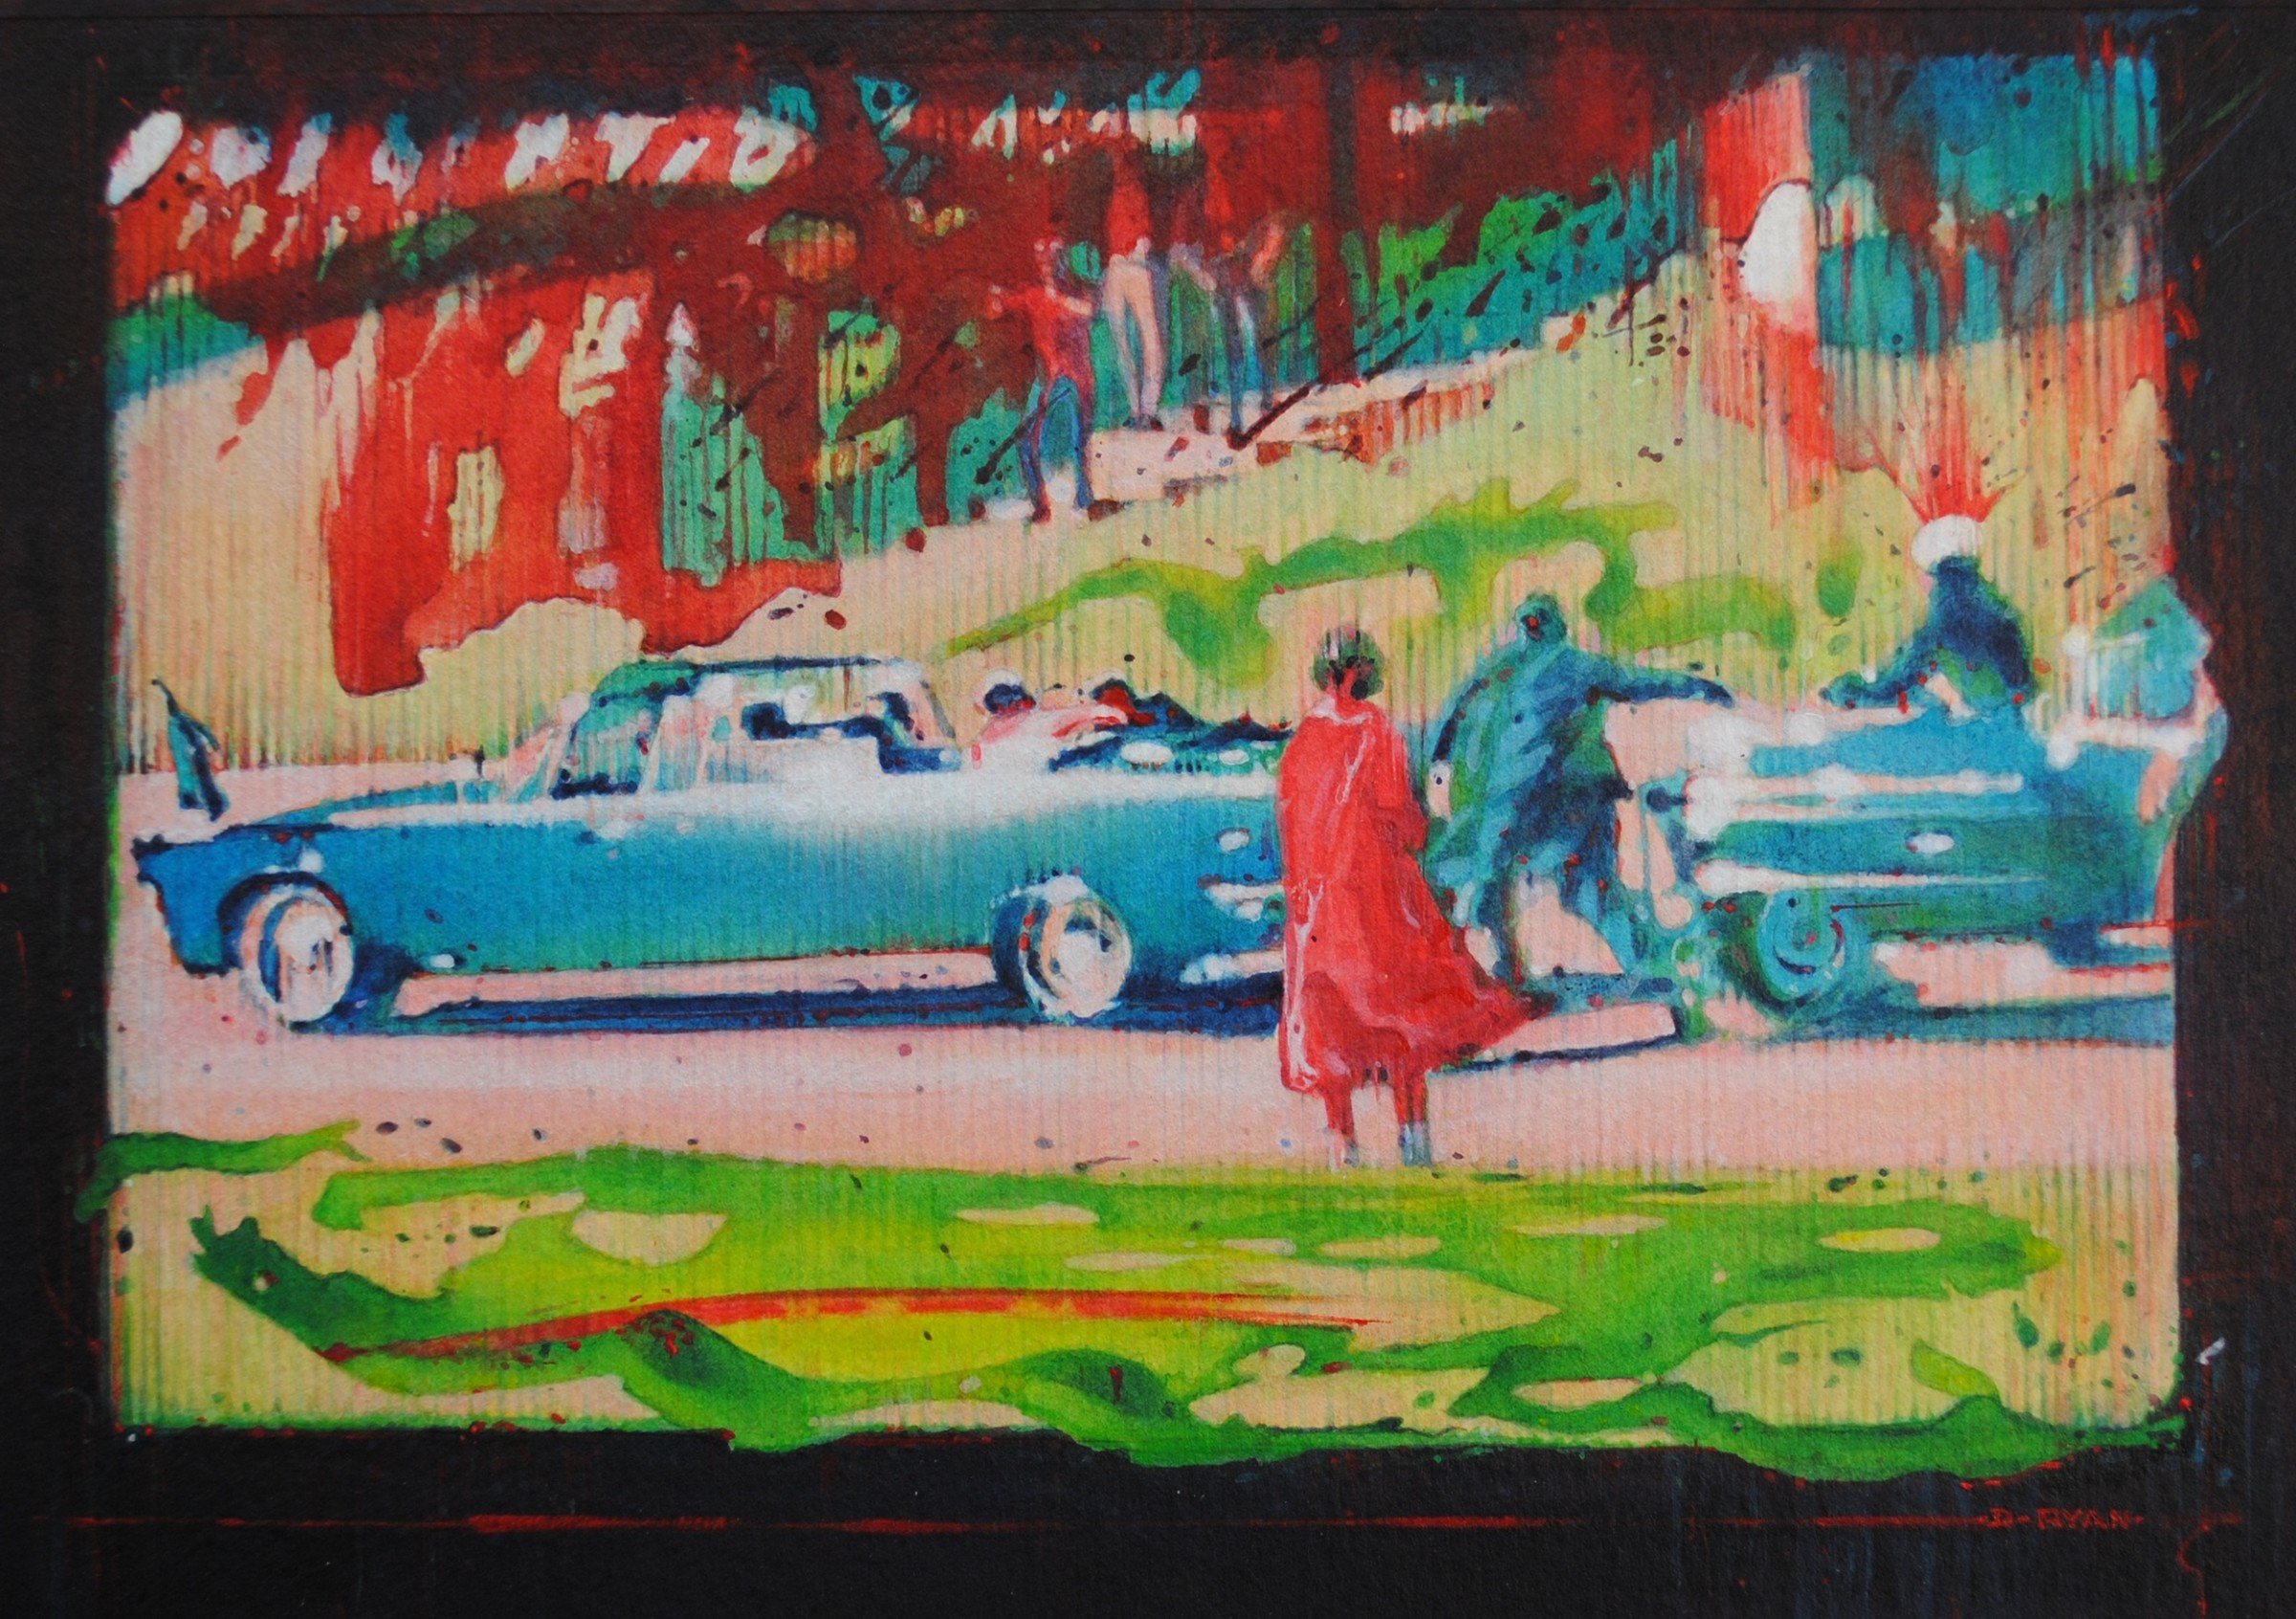 <span class=&#34;link fancybox-details-link&#34;><a href=&#34;/exhibitions/24/works/artworks_standalone10797/&#34;>View Detail Page</a></span><div class=&#34;artist&#34;><span class=&#34;artist&#34;><strong>Denis Ryan</strong></span></div><div class=&#34;title&#34;><em>Assassination in Dallas November 1963</em></div><div class=&#34;medium&#34;>acrylic</div><div class=&#34;dimensions&#34;>29x33cm</div>